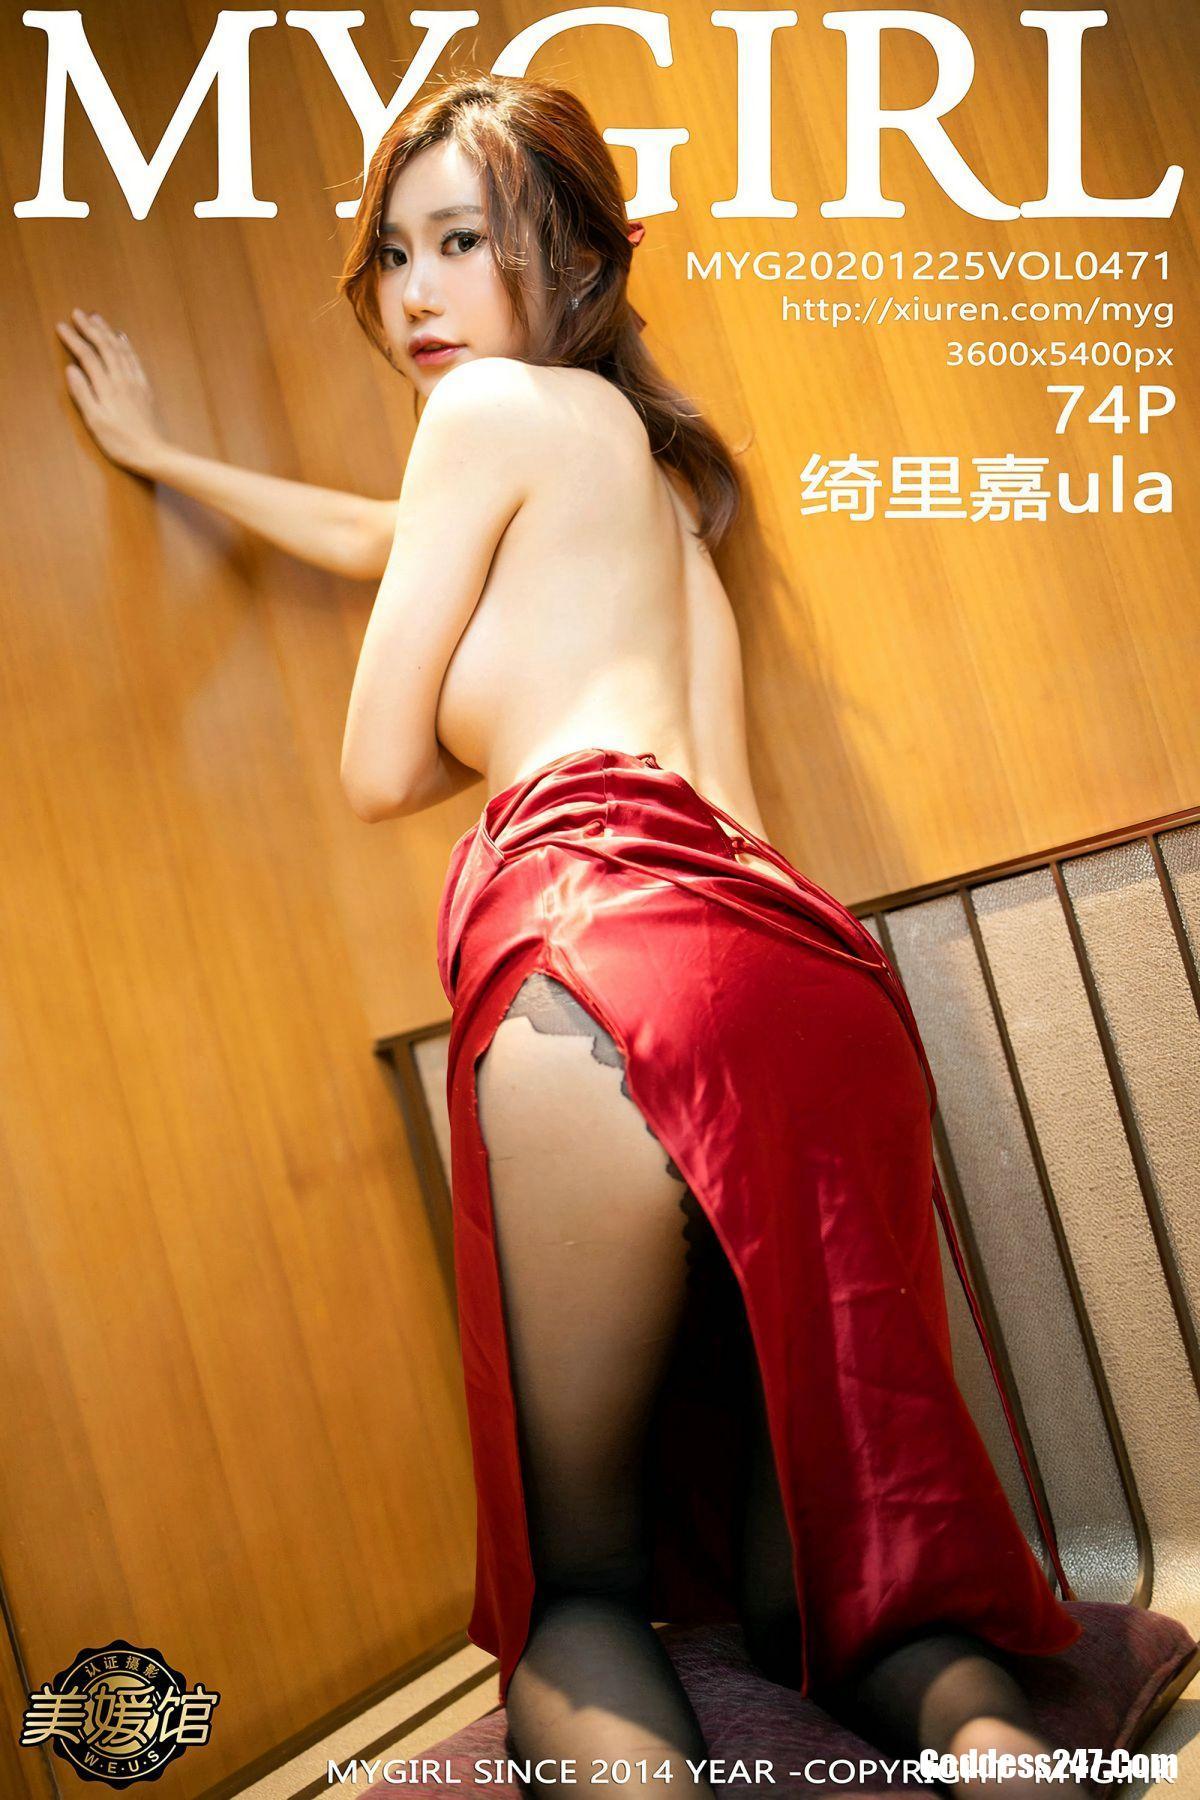 MyGirl美媛馆 Vol.471 绮里嘉ula